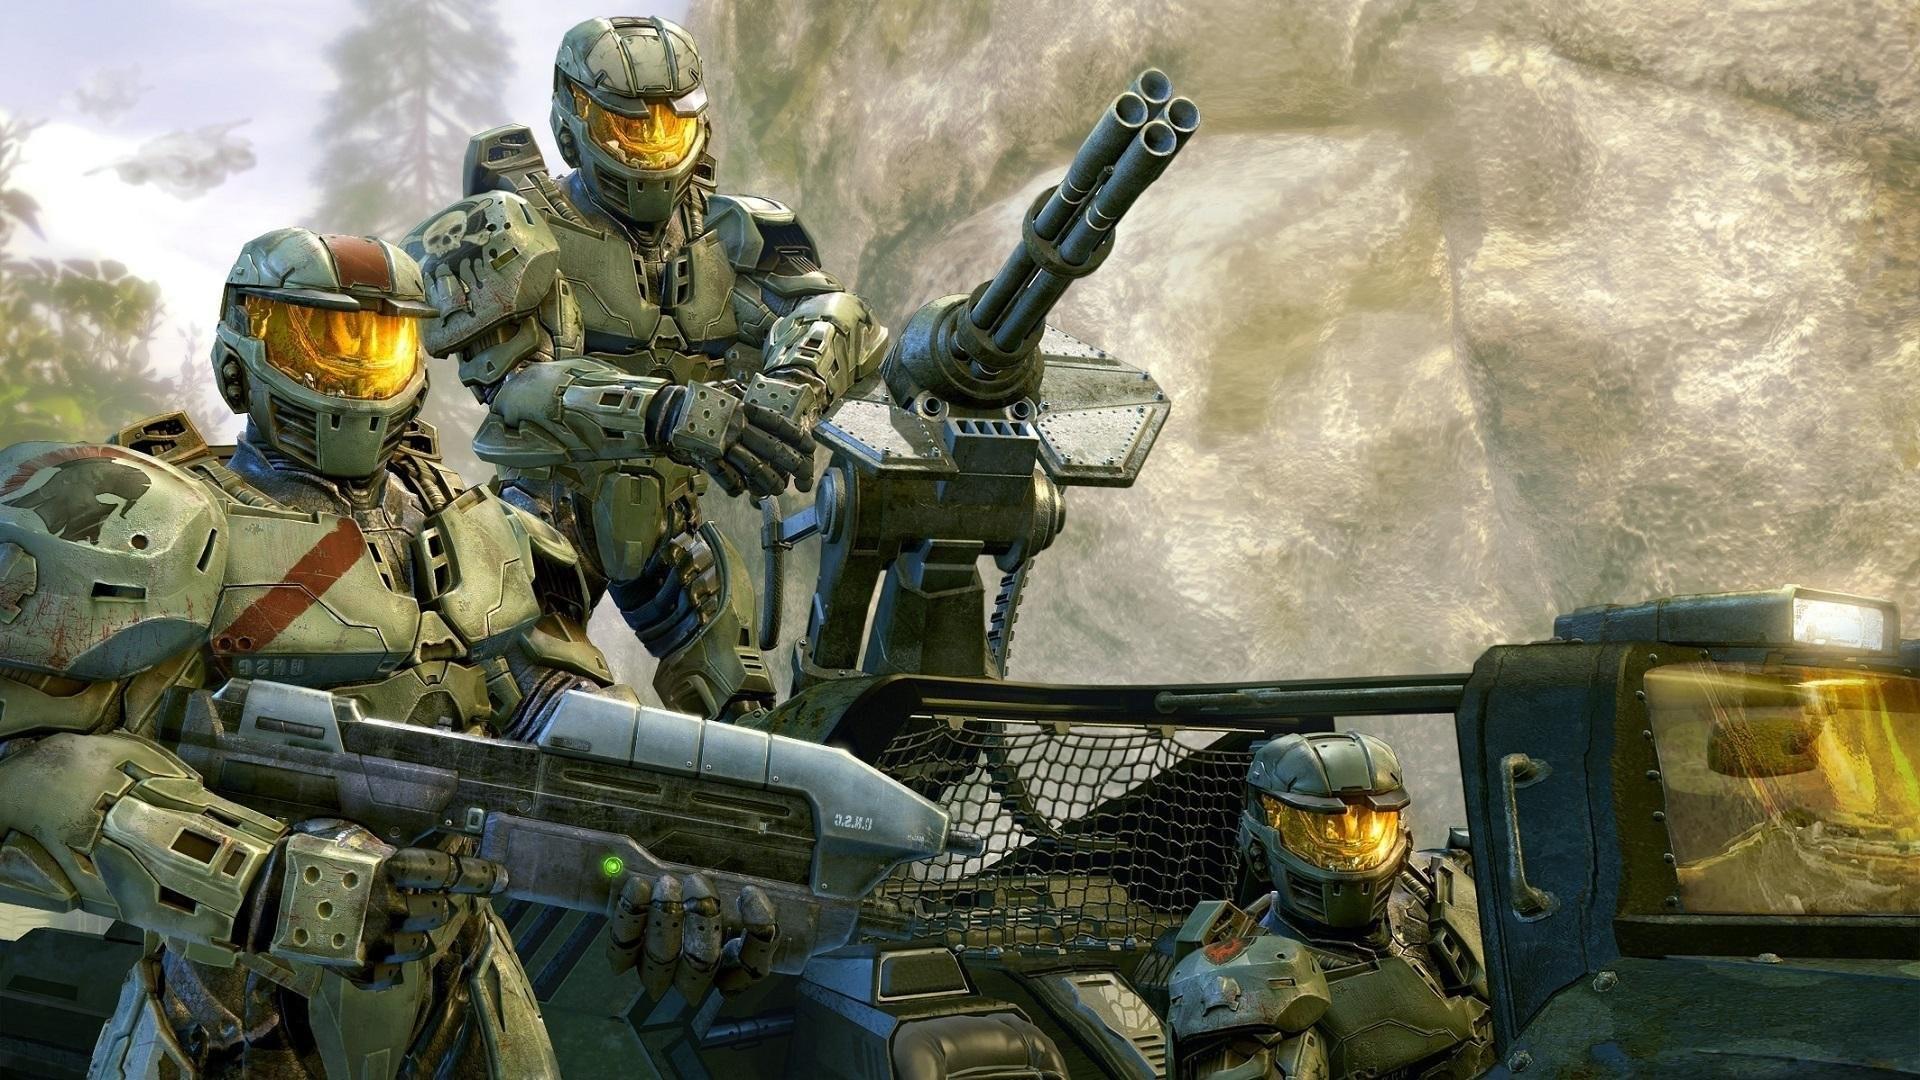 Res: 1920x1080, Halo: Spartan Assault HD Wallpaper 21 - 1920 X 1080